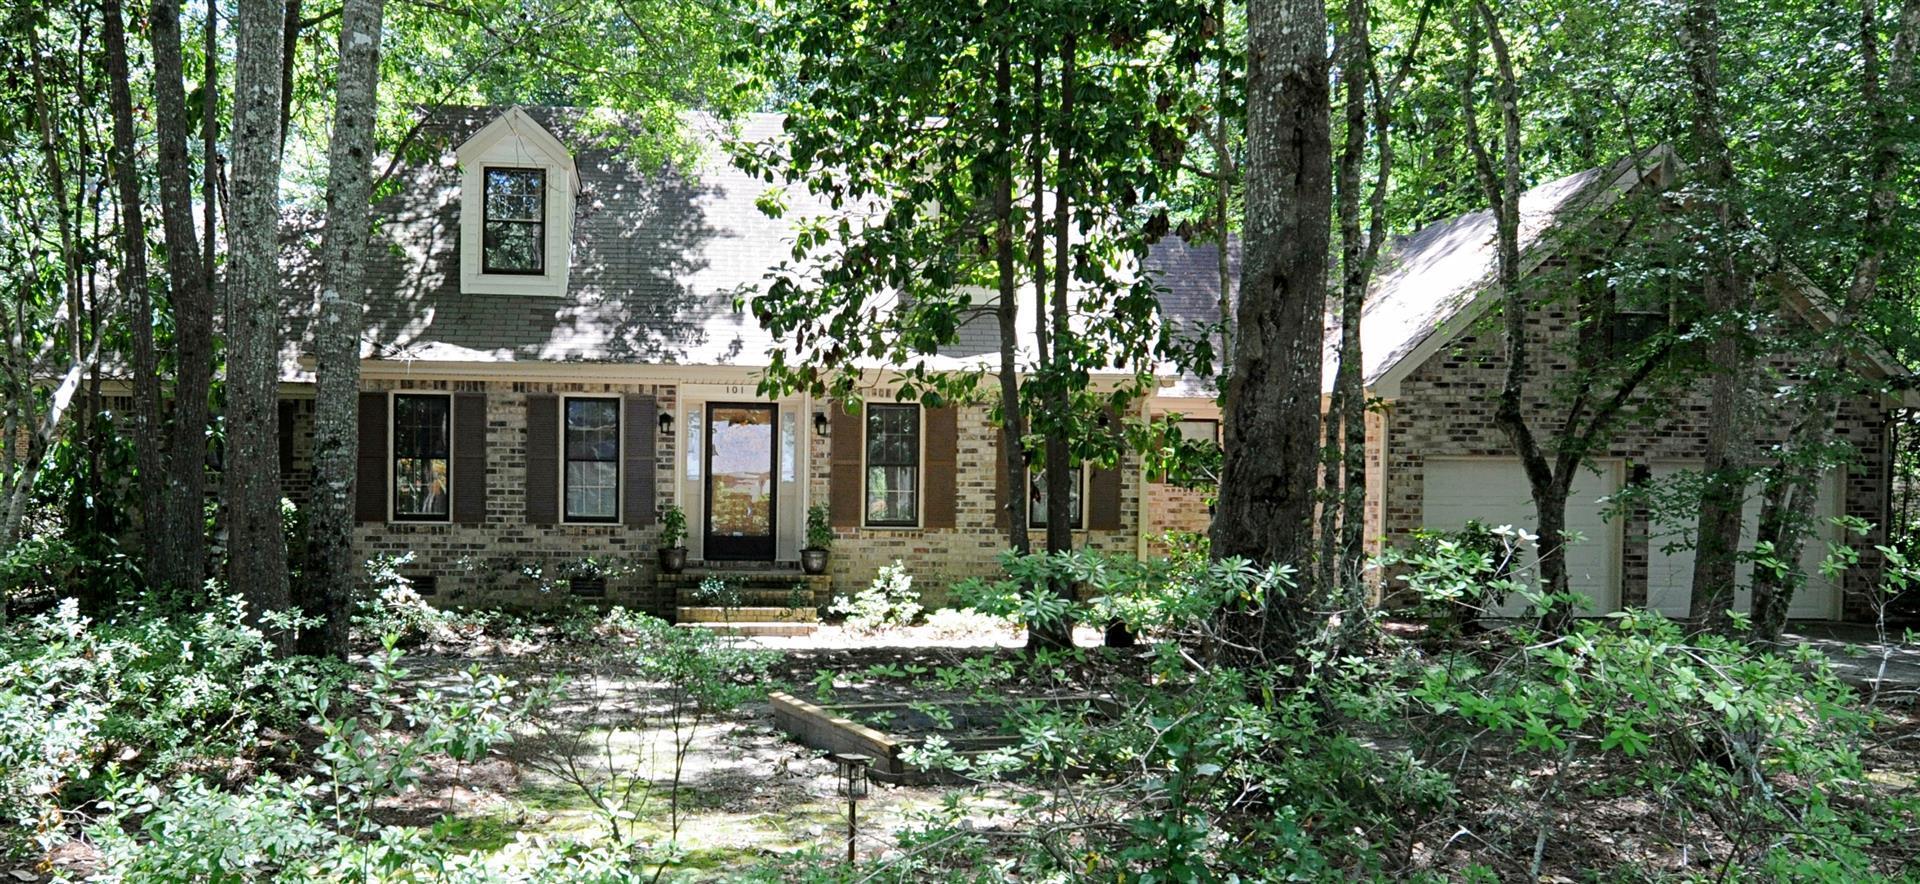 101  Huckleberry Lane Summerville, SC 29485